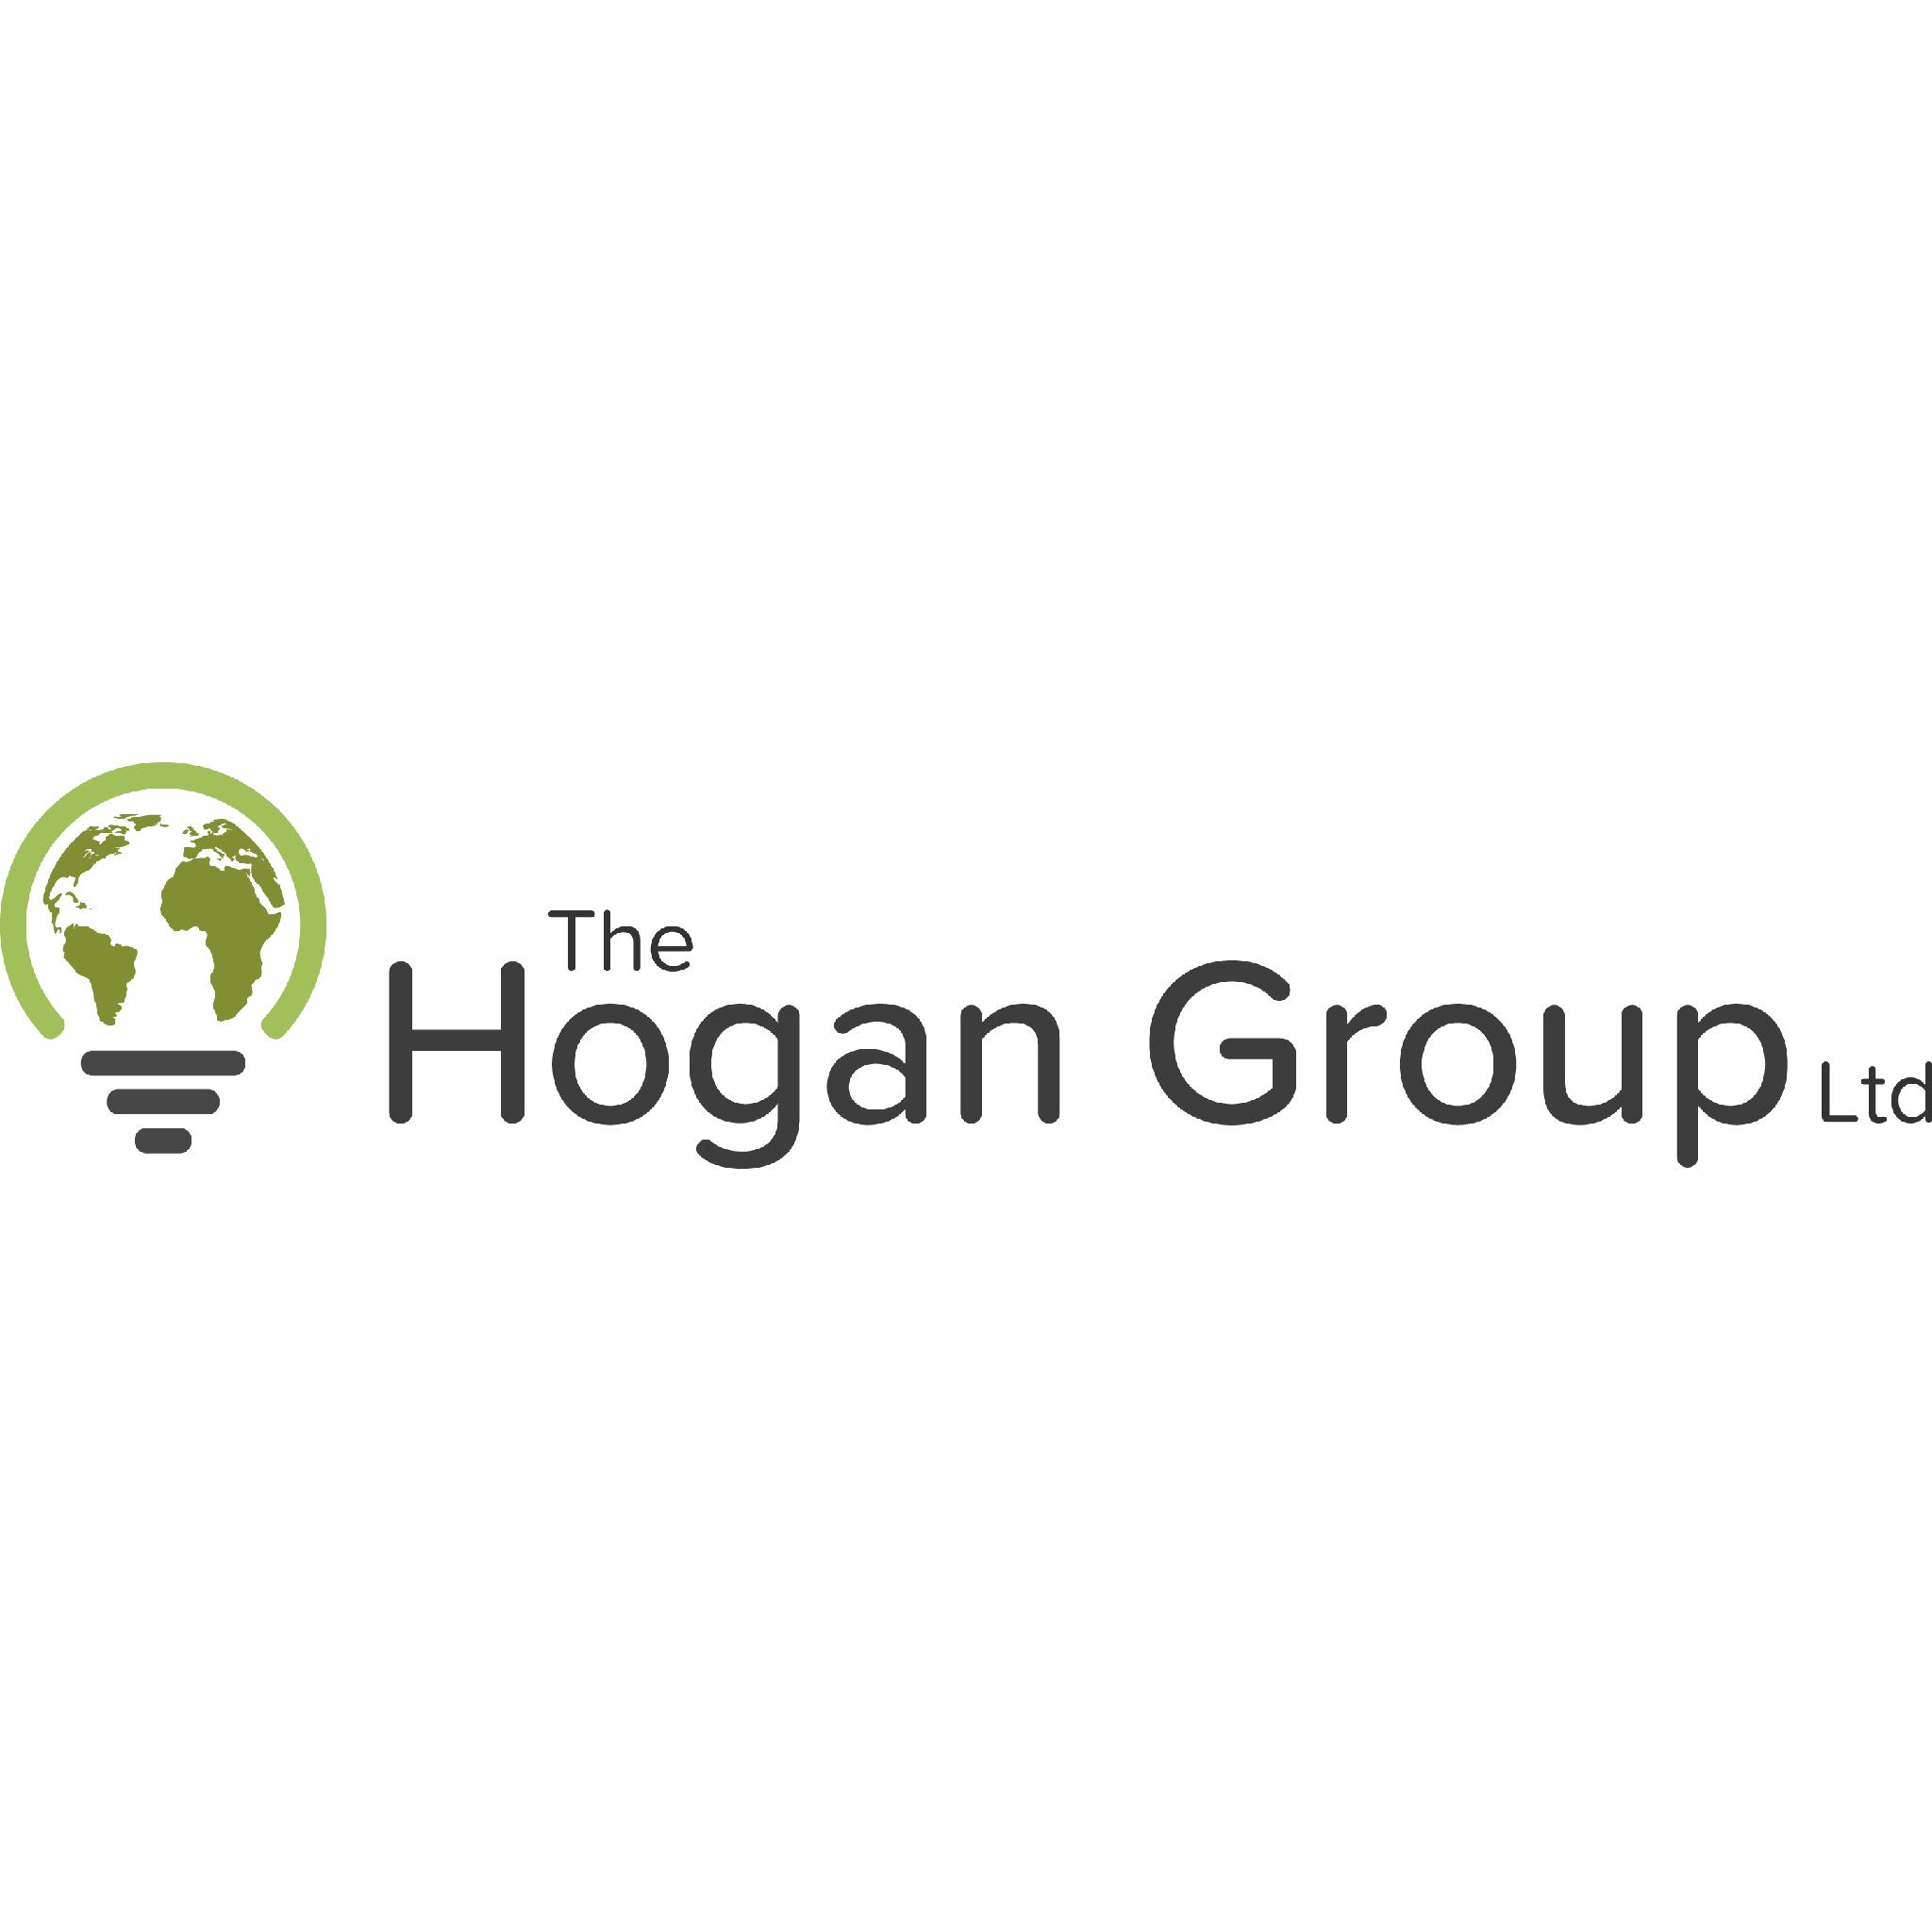 The Hogan Group Ltd - Ossett, West Yorkshire WF5 9ND - 01924 562204 | ShowMeLocal.com